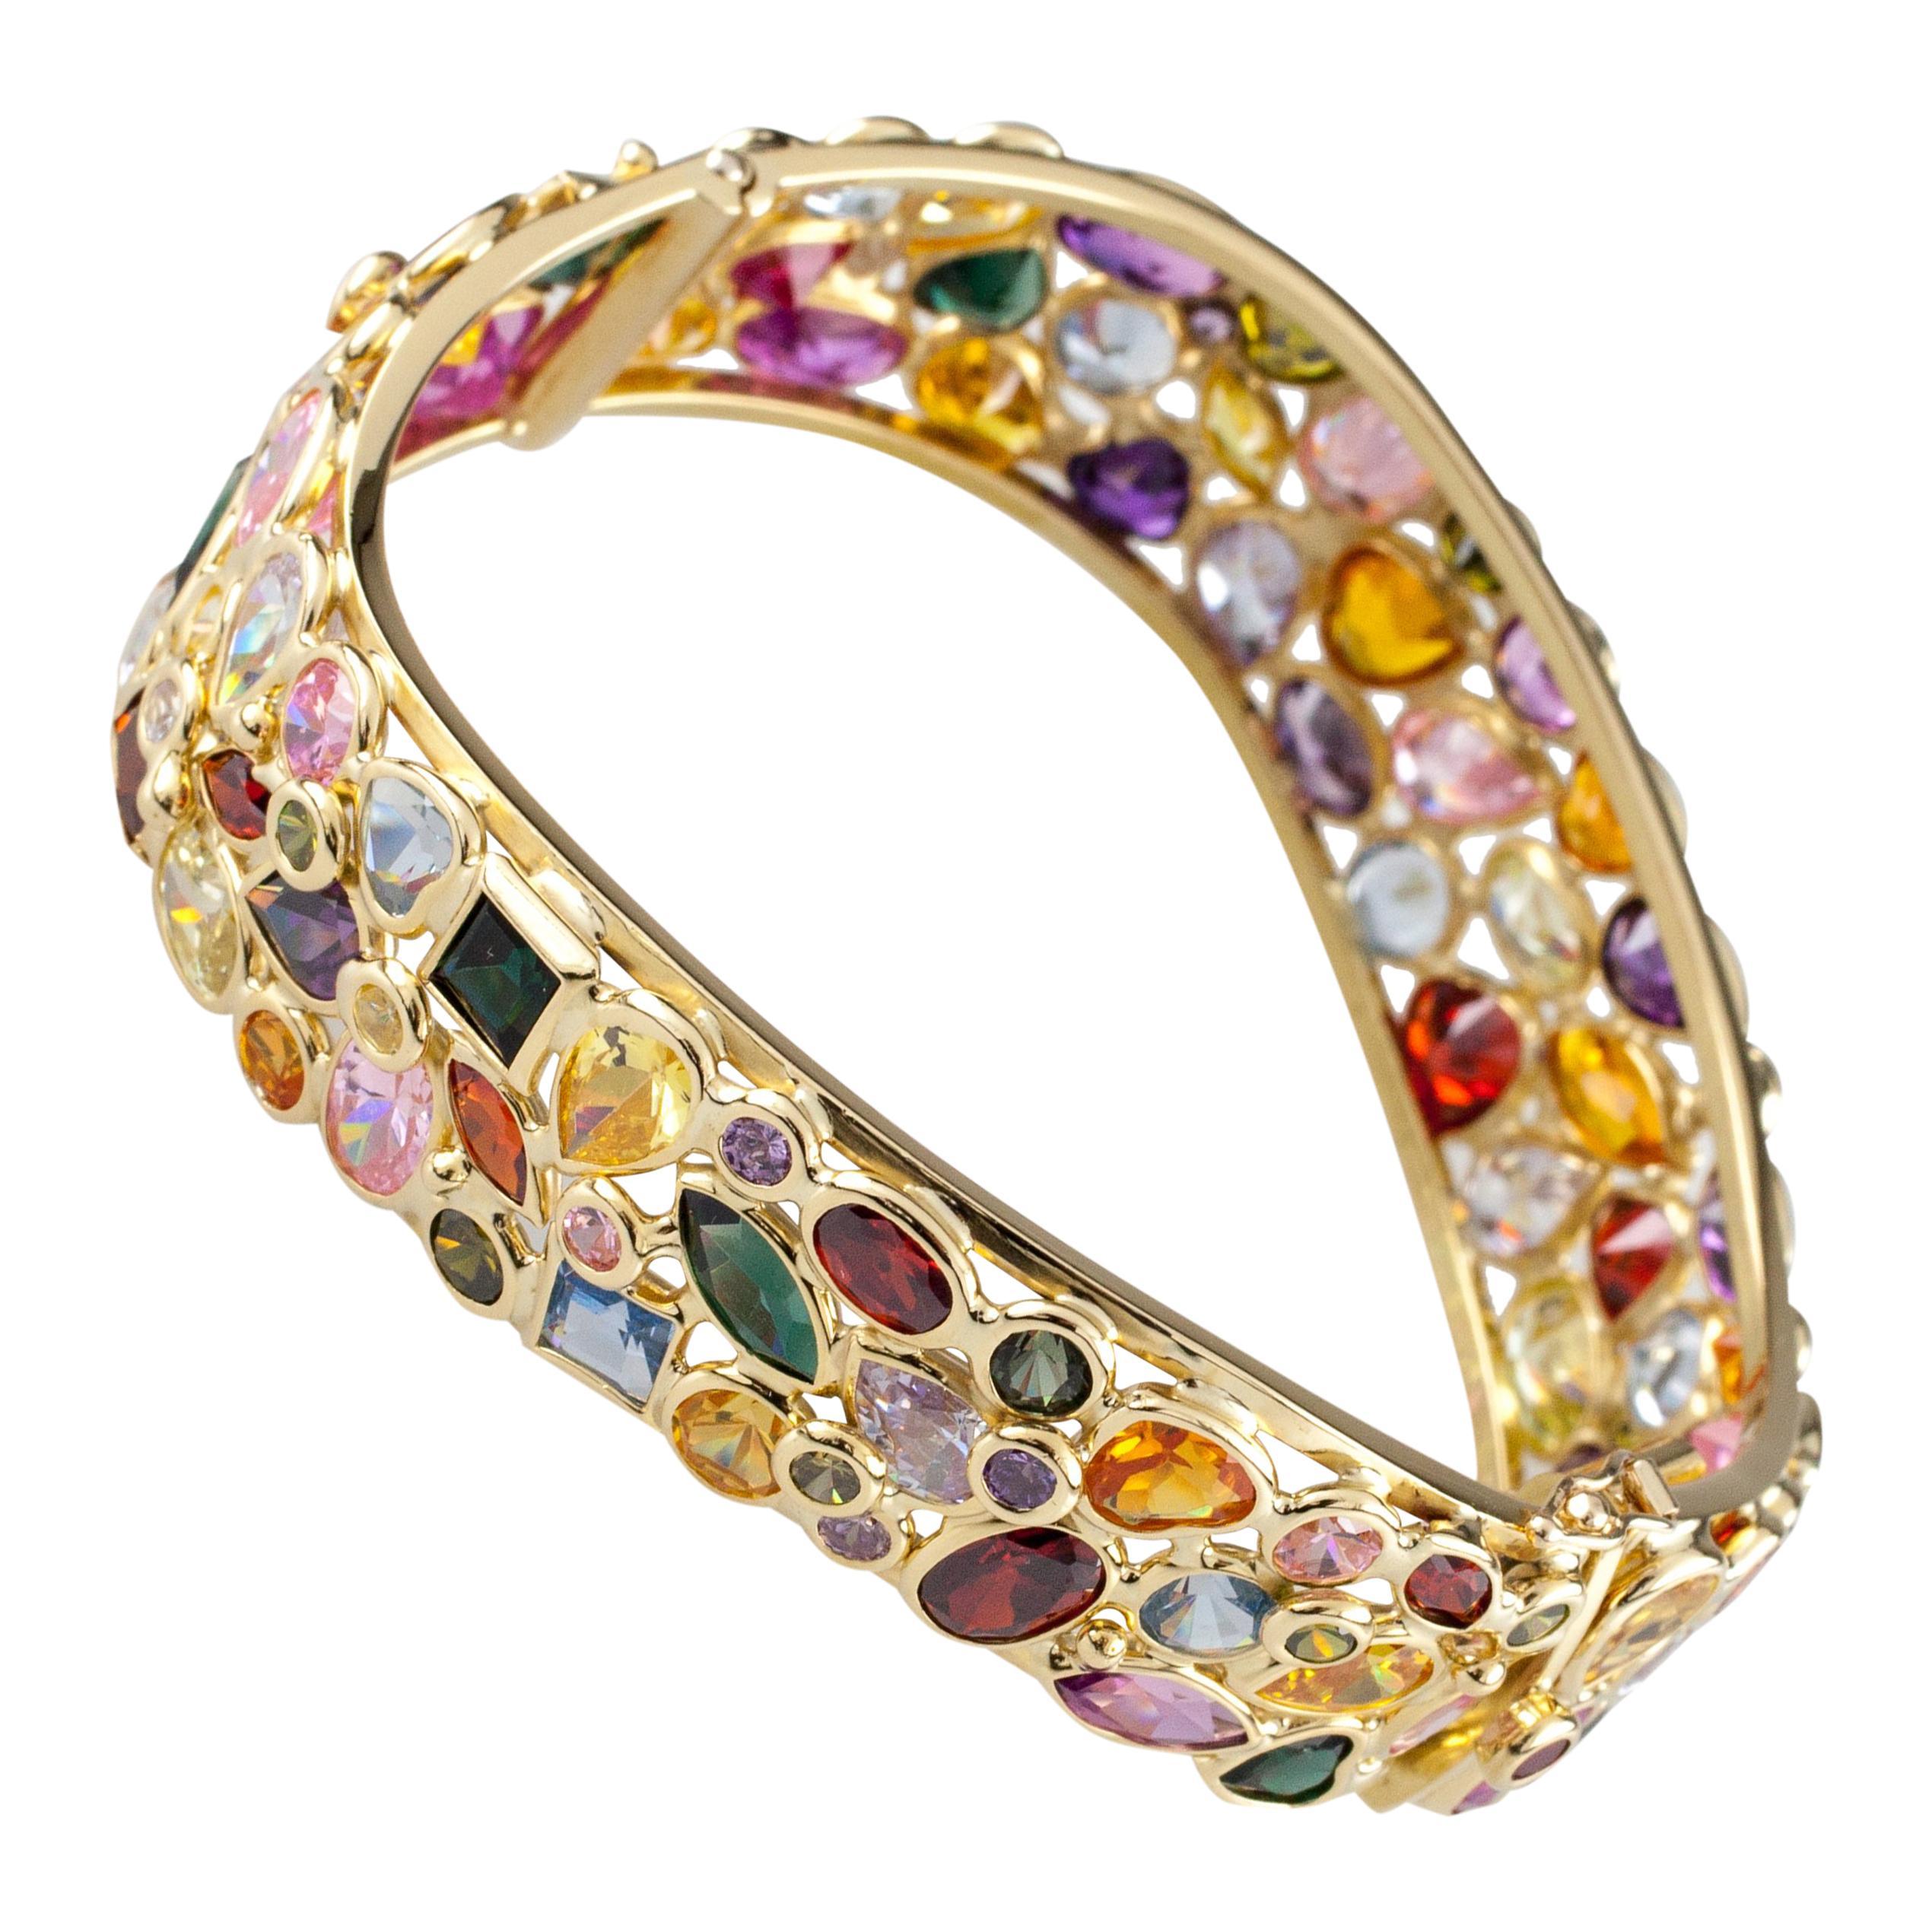 18 Karat Yellow Gold Multicolored Gemstone Bangle Bracelet